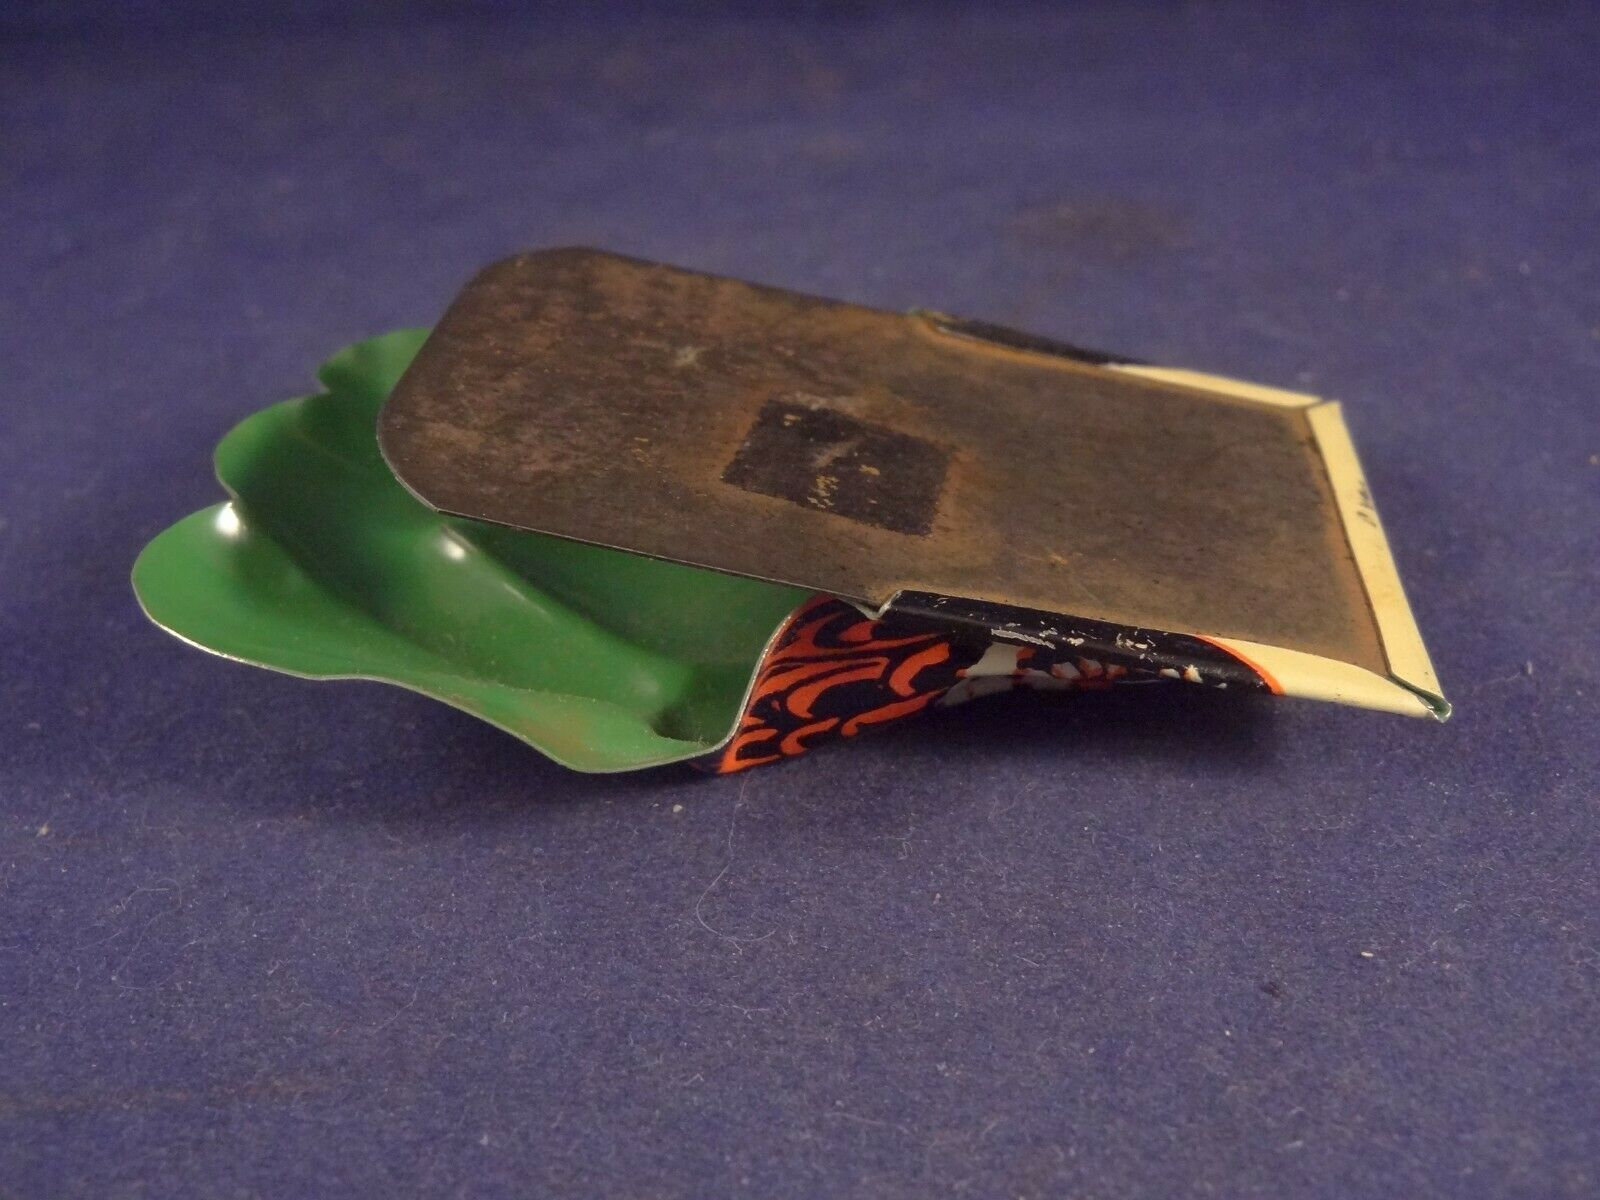 Ancien jouet rare clic-clac clicker cri-cri chouette hibou tôle années 40-50